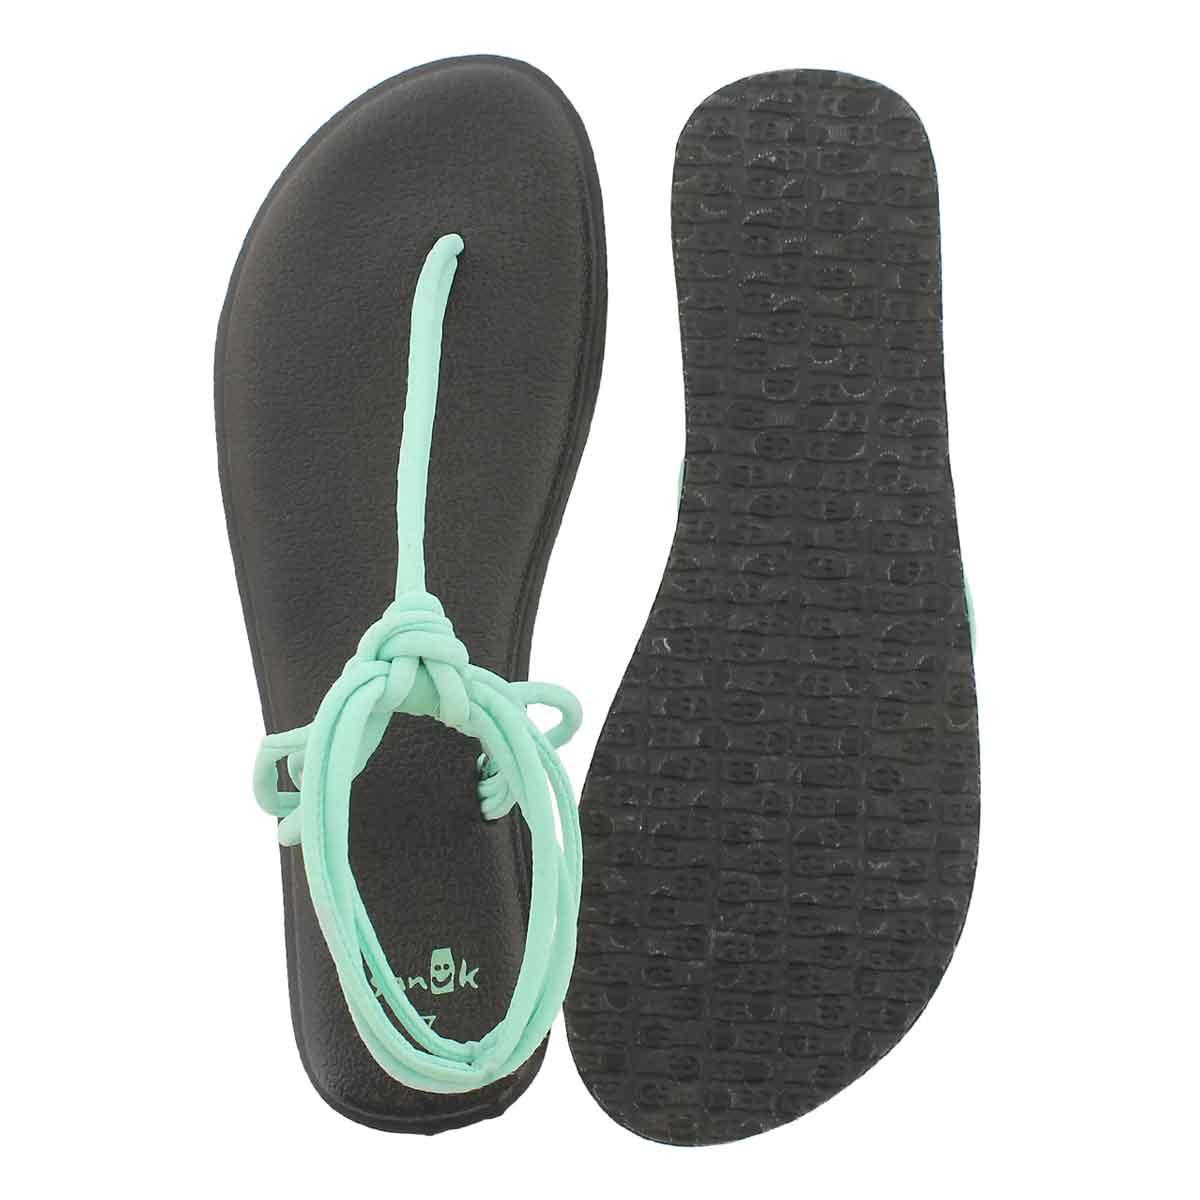 Lds Yoga Sunshine opal thong sandal